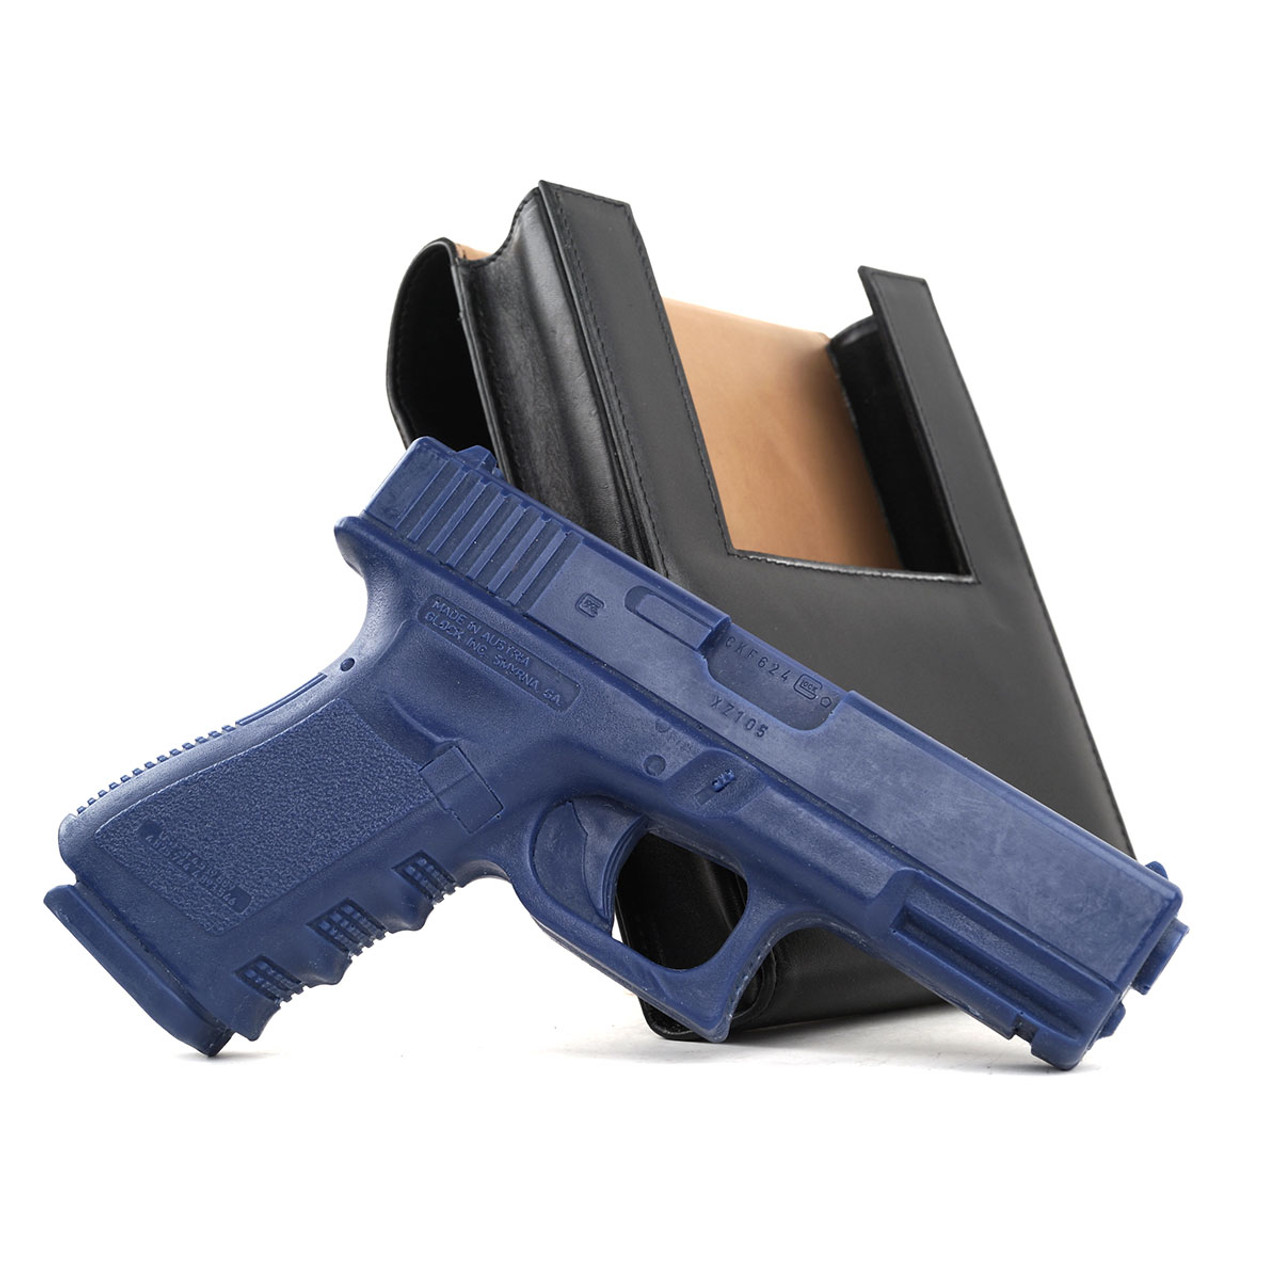 Glock 23 Concealed Carry Holster (Belt Loop)